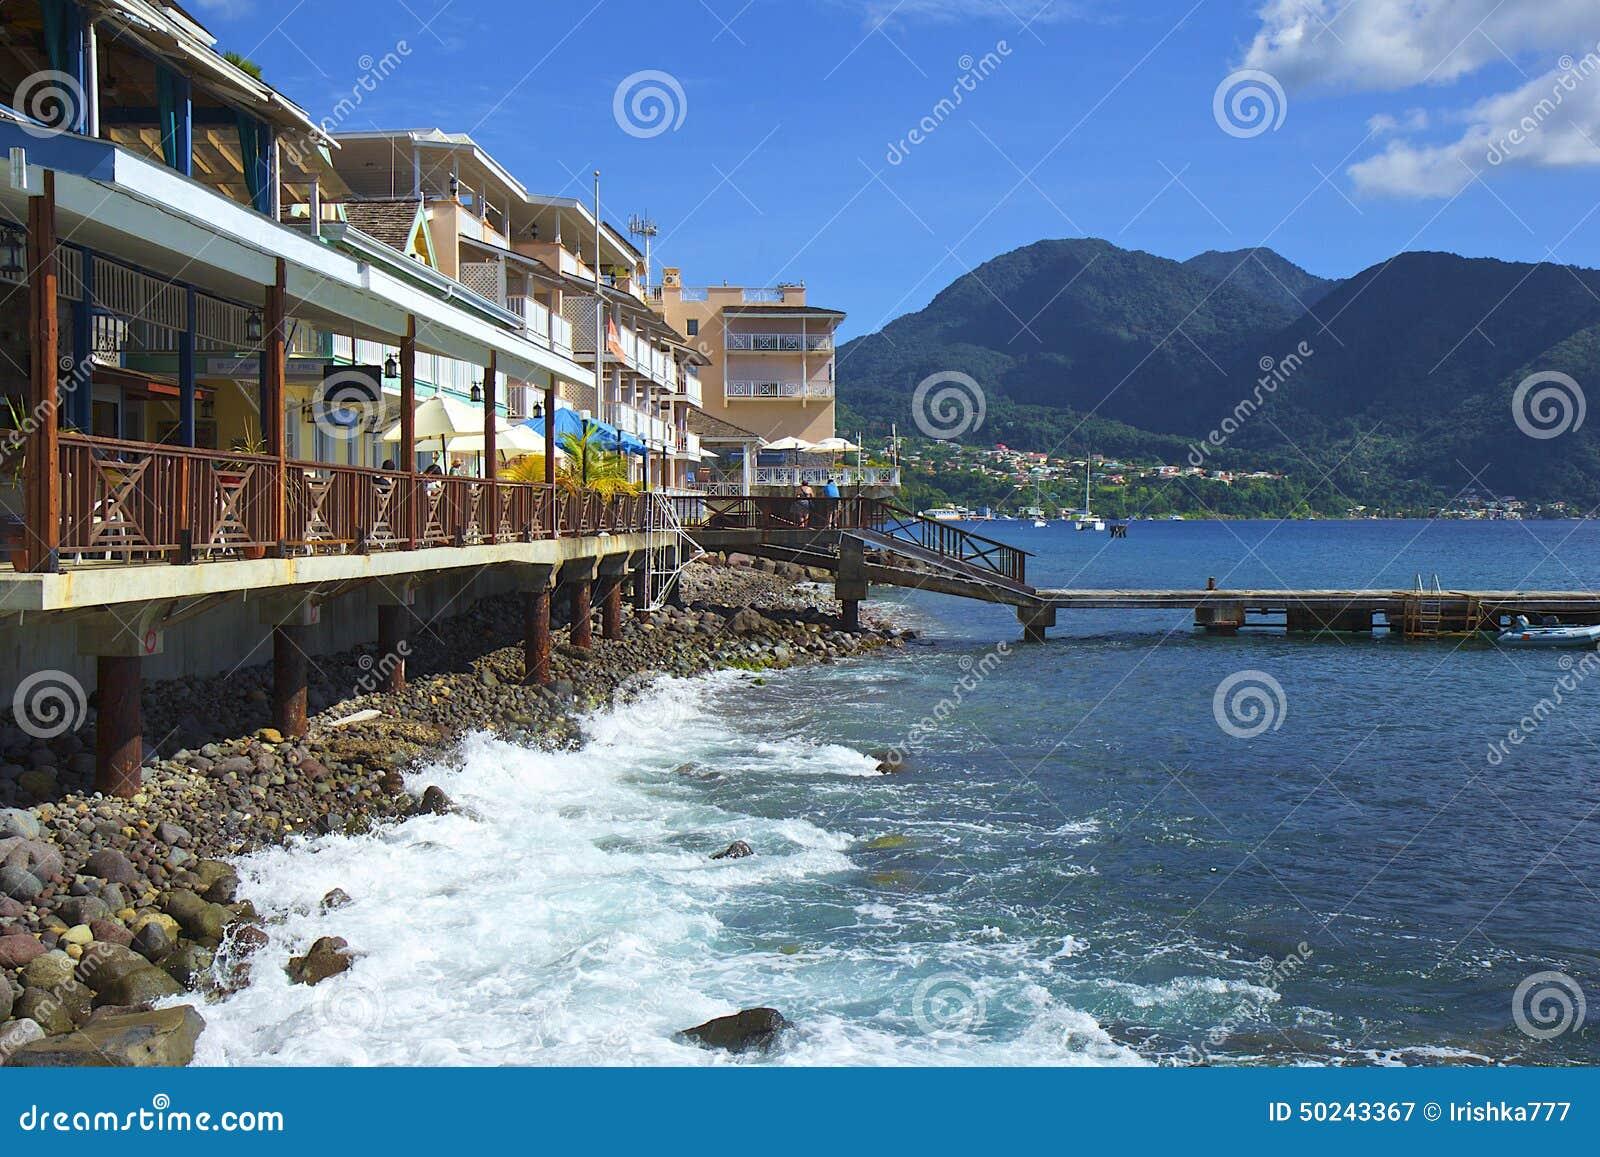 Roseau waterfront in Dominica, Caribbean